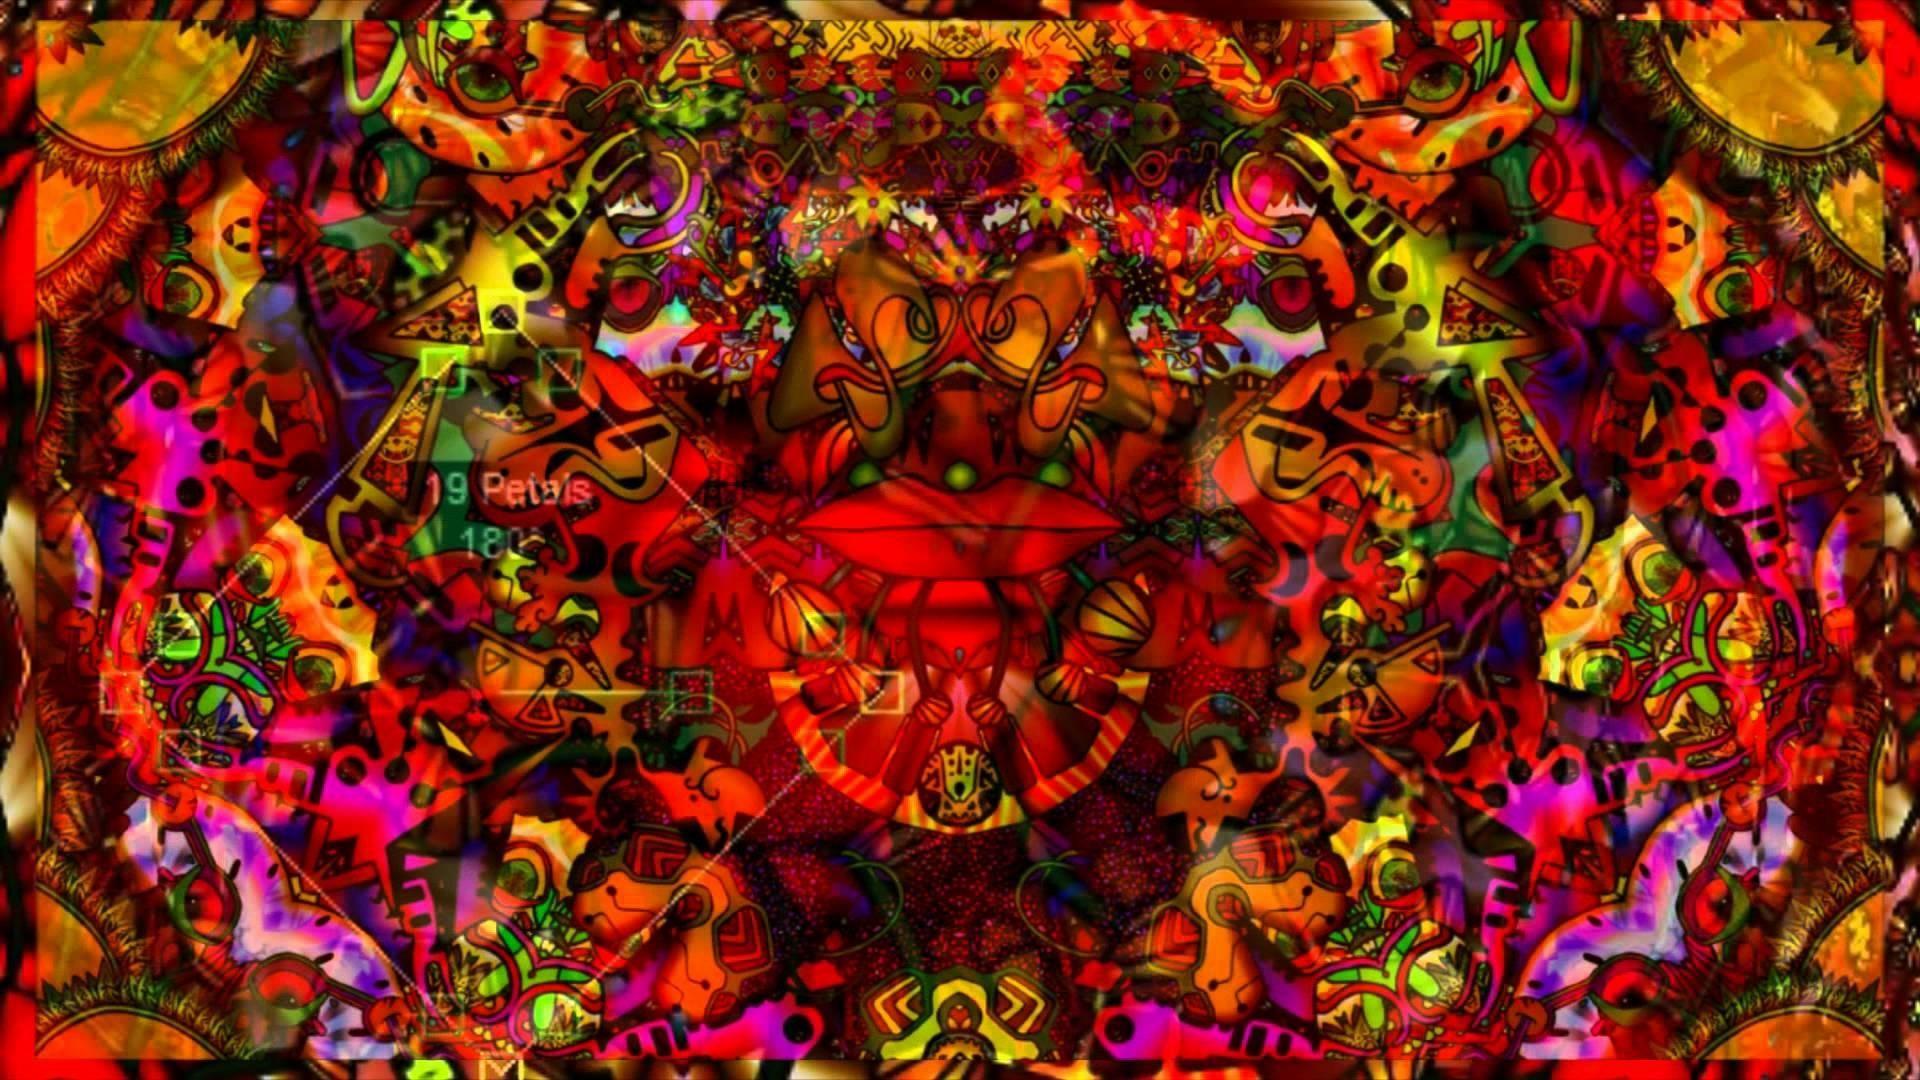 wallpaper.wiki-Image-of-Acid-Trip-Background-PIC-